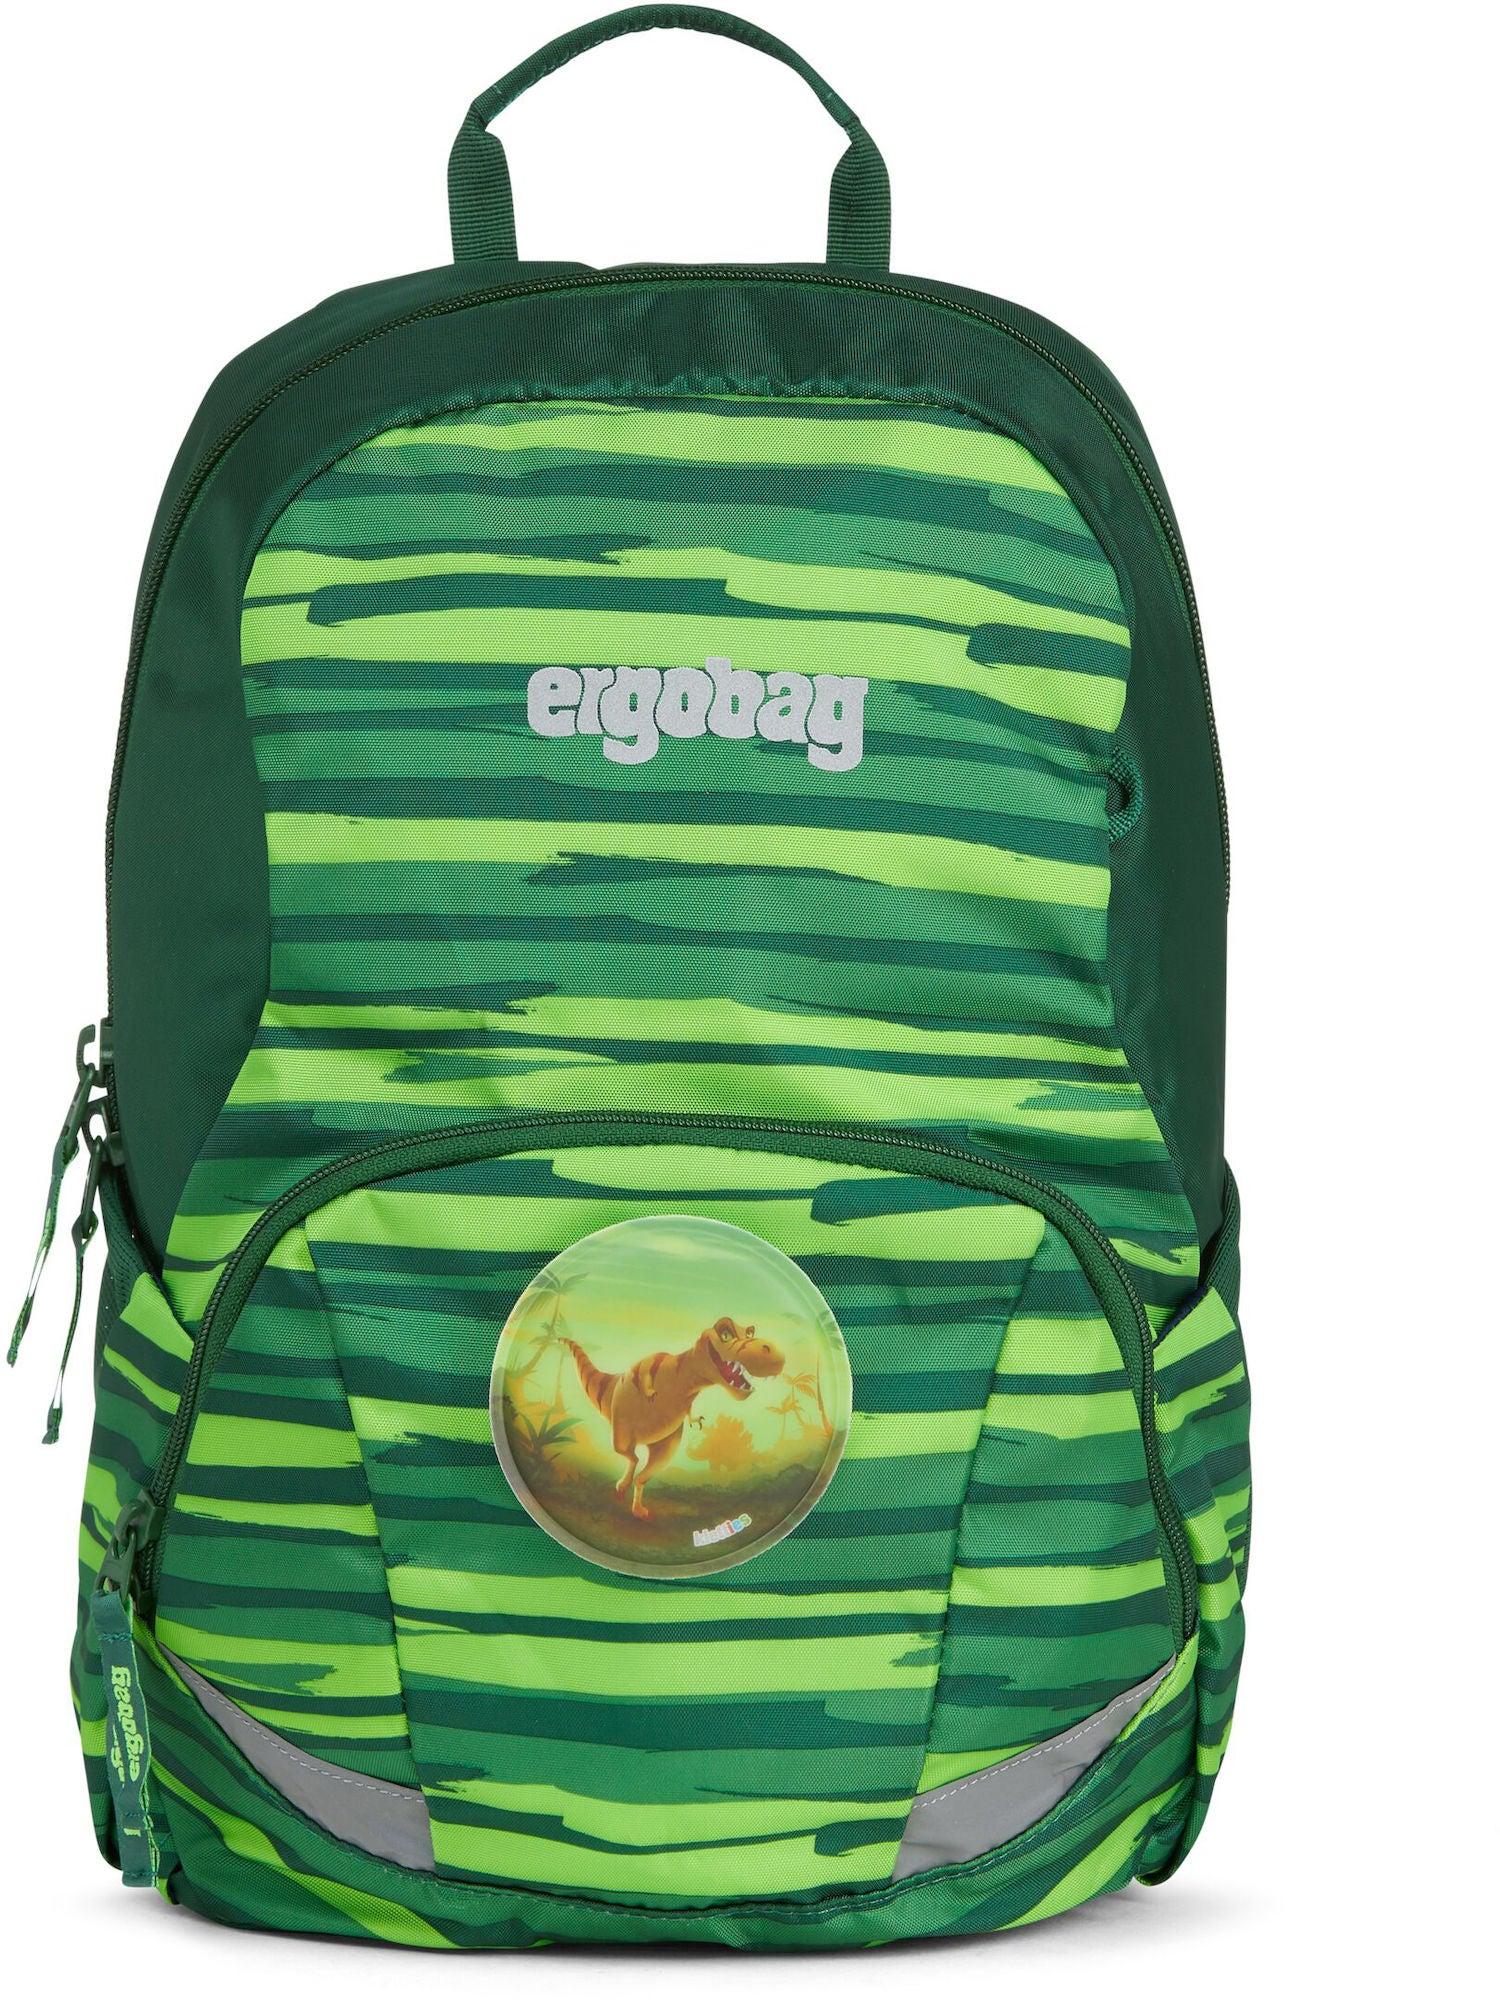 Ergobag Ease Jungle Ryggsäck 10L, Green Check